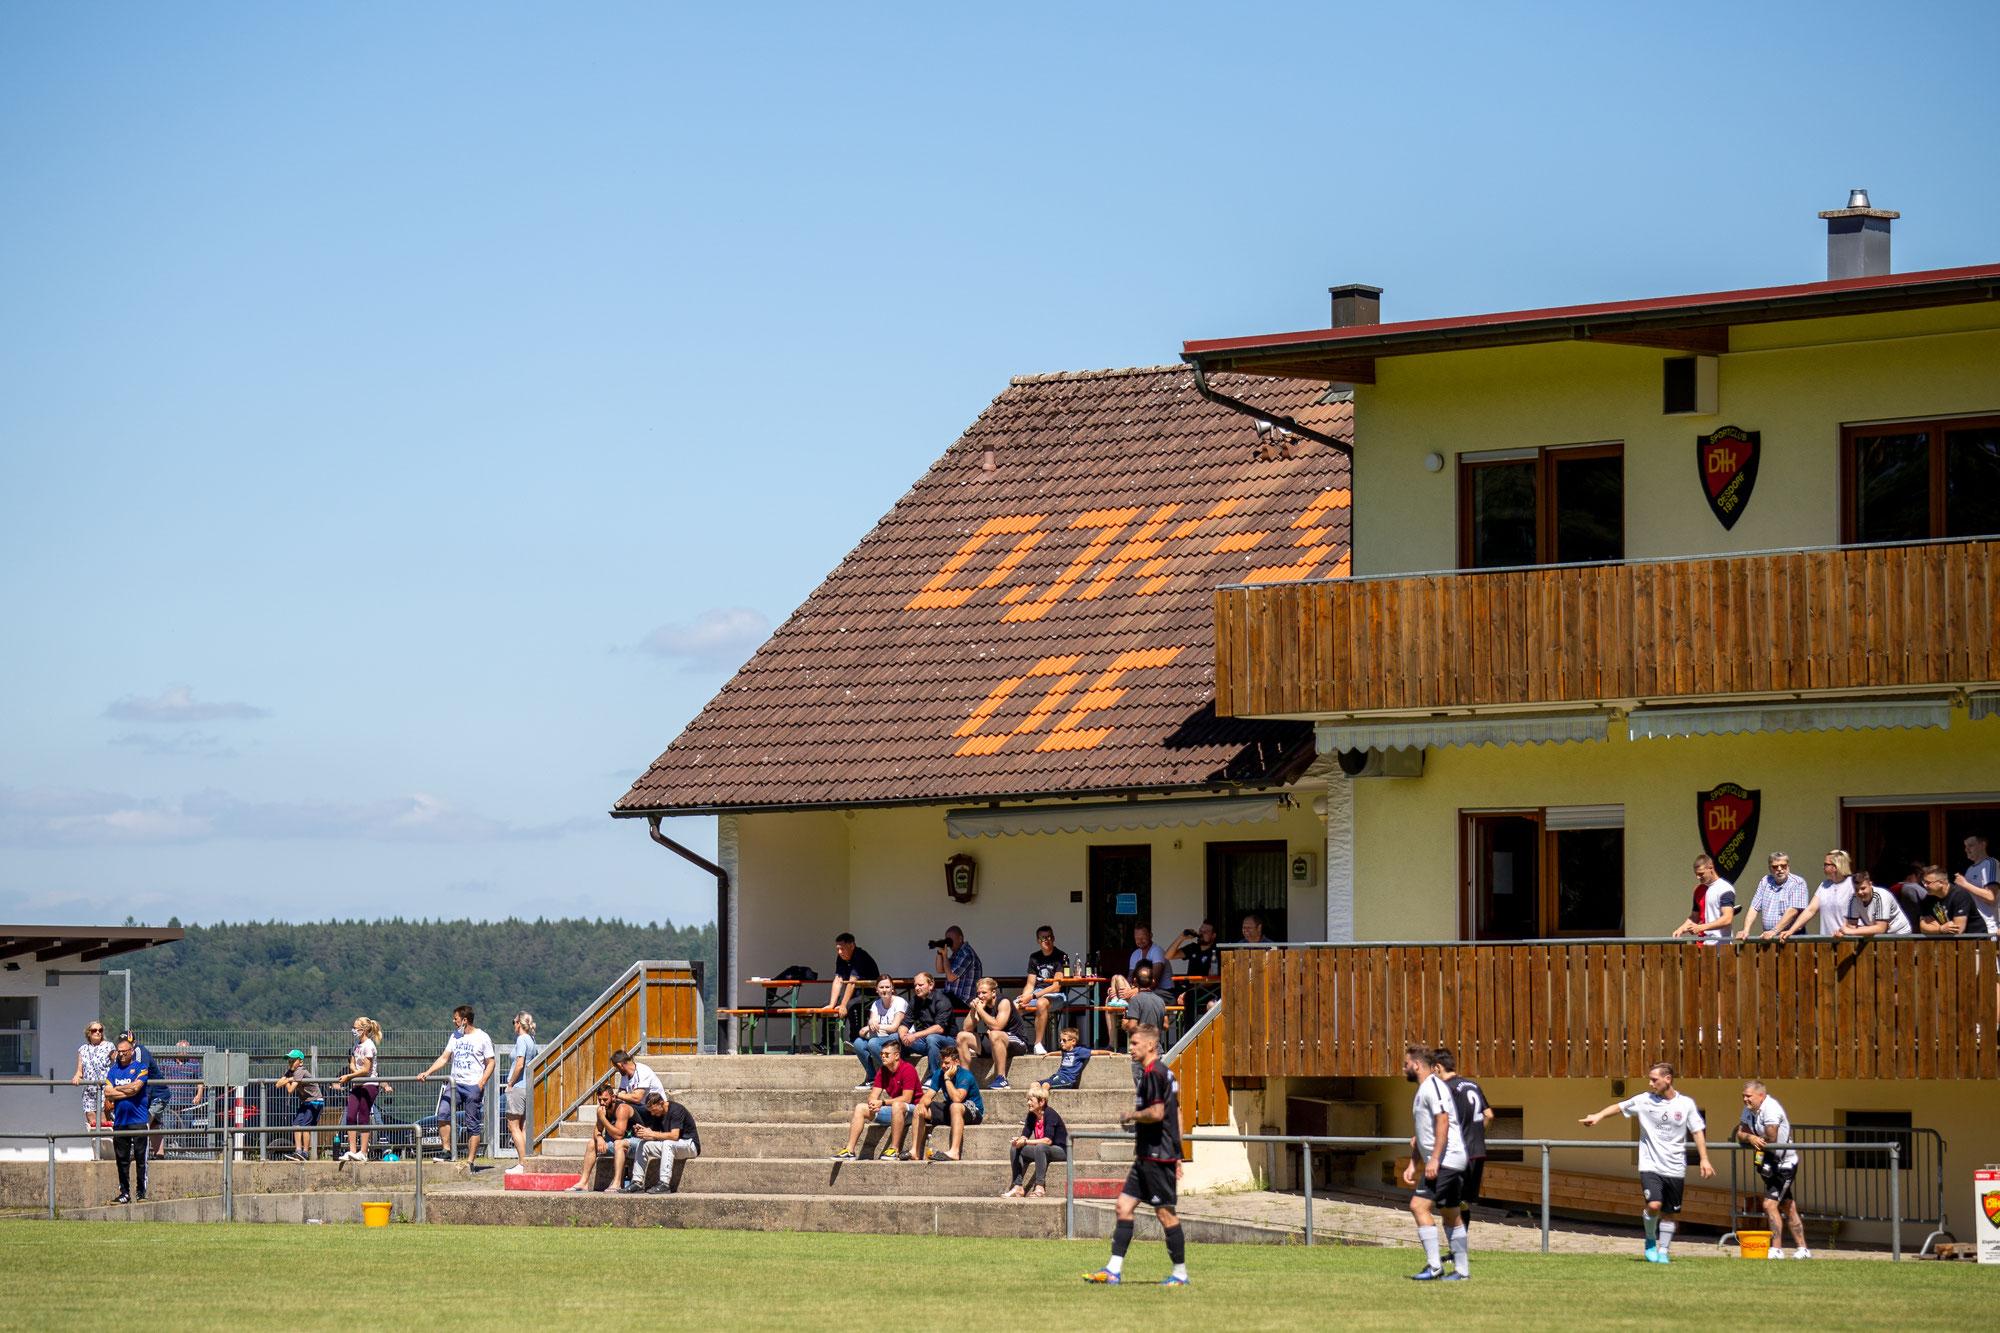 Groundhopping: DJK-SC Oesdorf vs. Vatan Spor Nürnberg